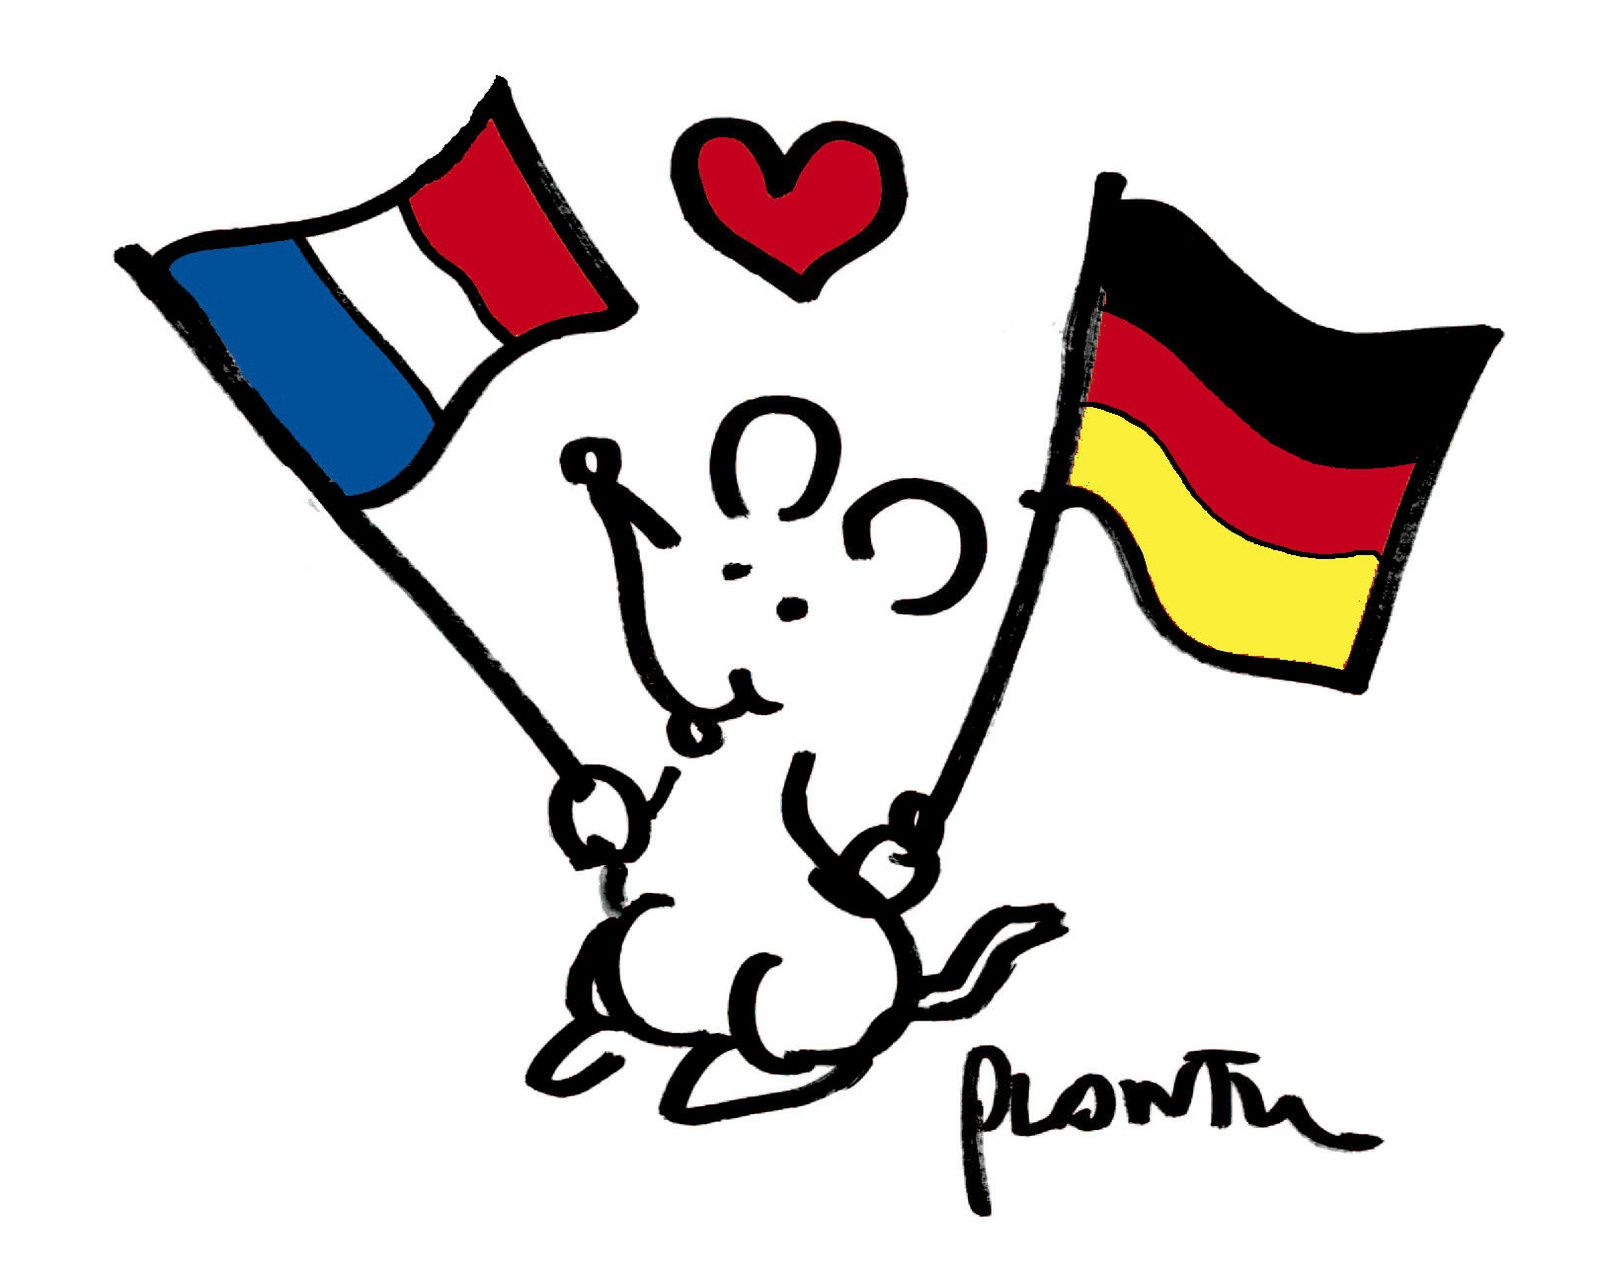 22 janvier 2016 : Journée Franco-Allemande